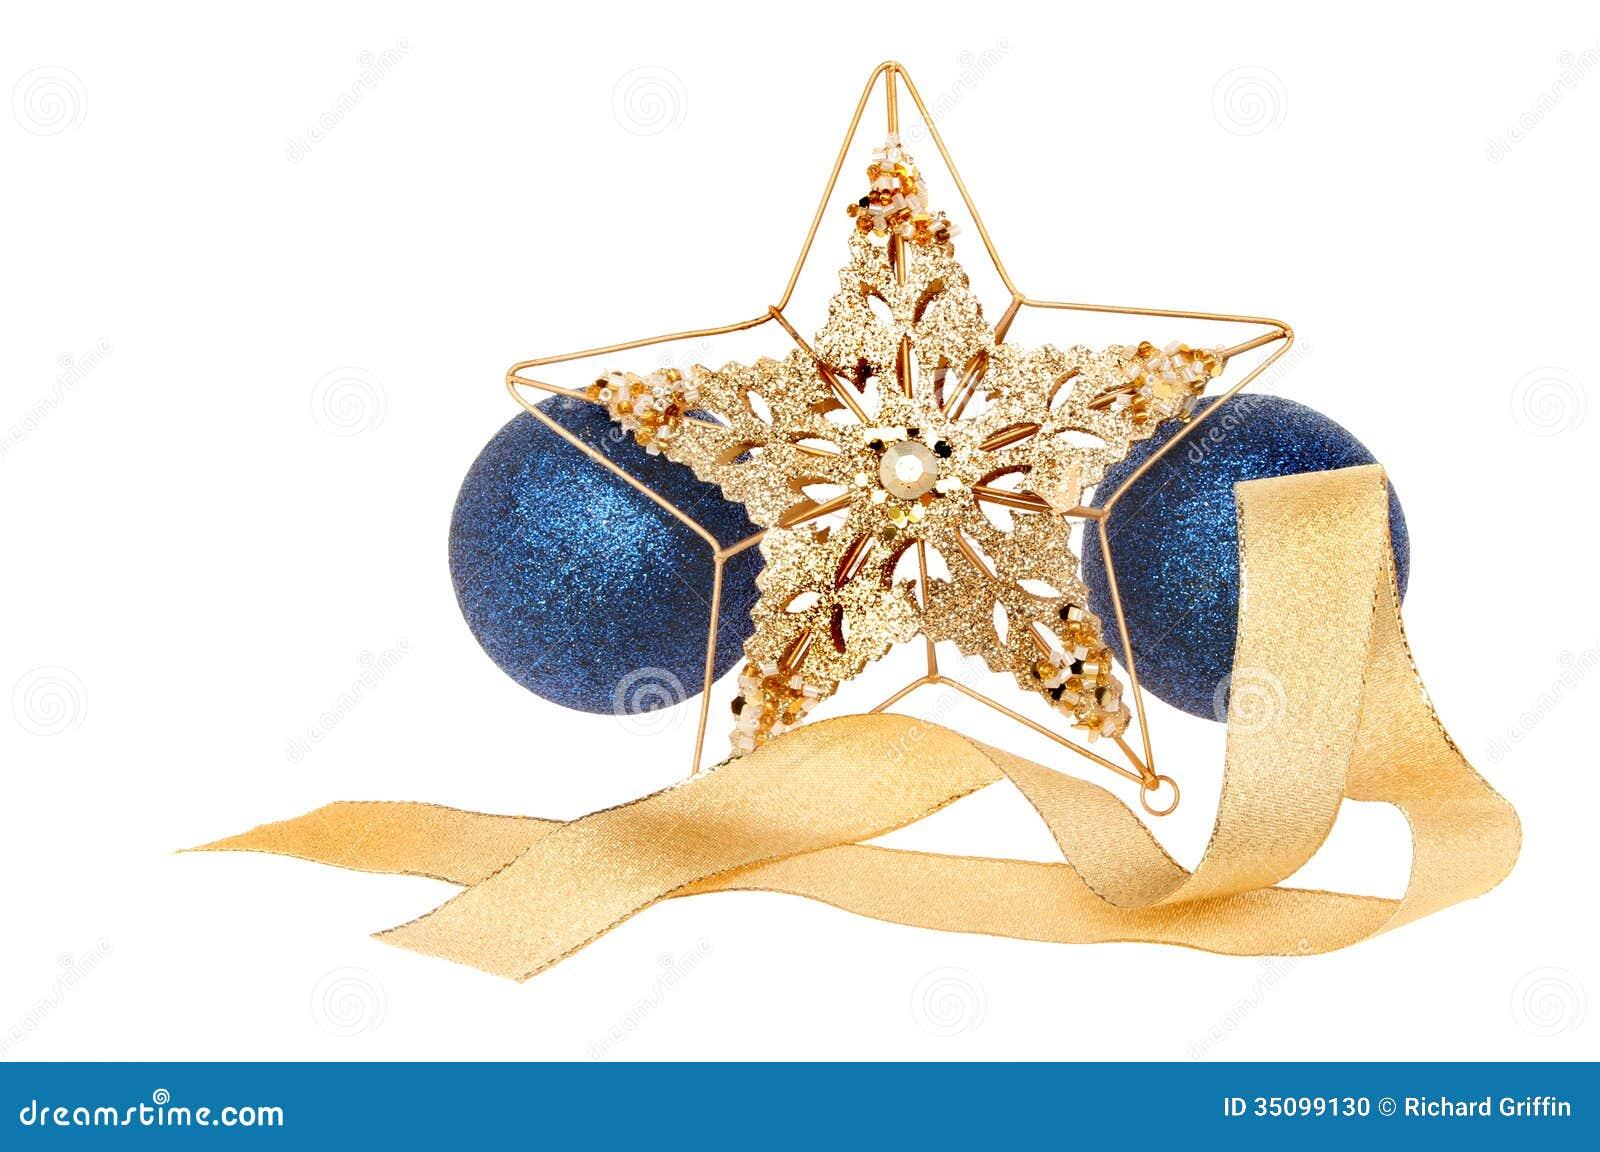 #AD7B1E Christmas Decoration Stock Photo Image: 35099130 6361 décoration noel commerce 1300x953 px @ aertt.com